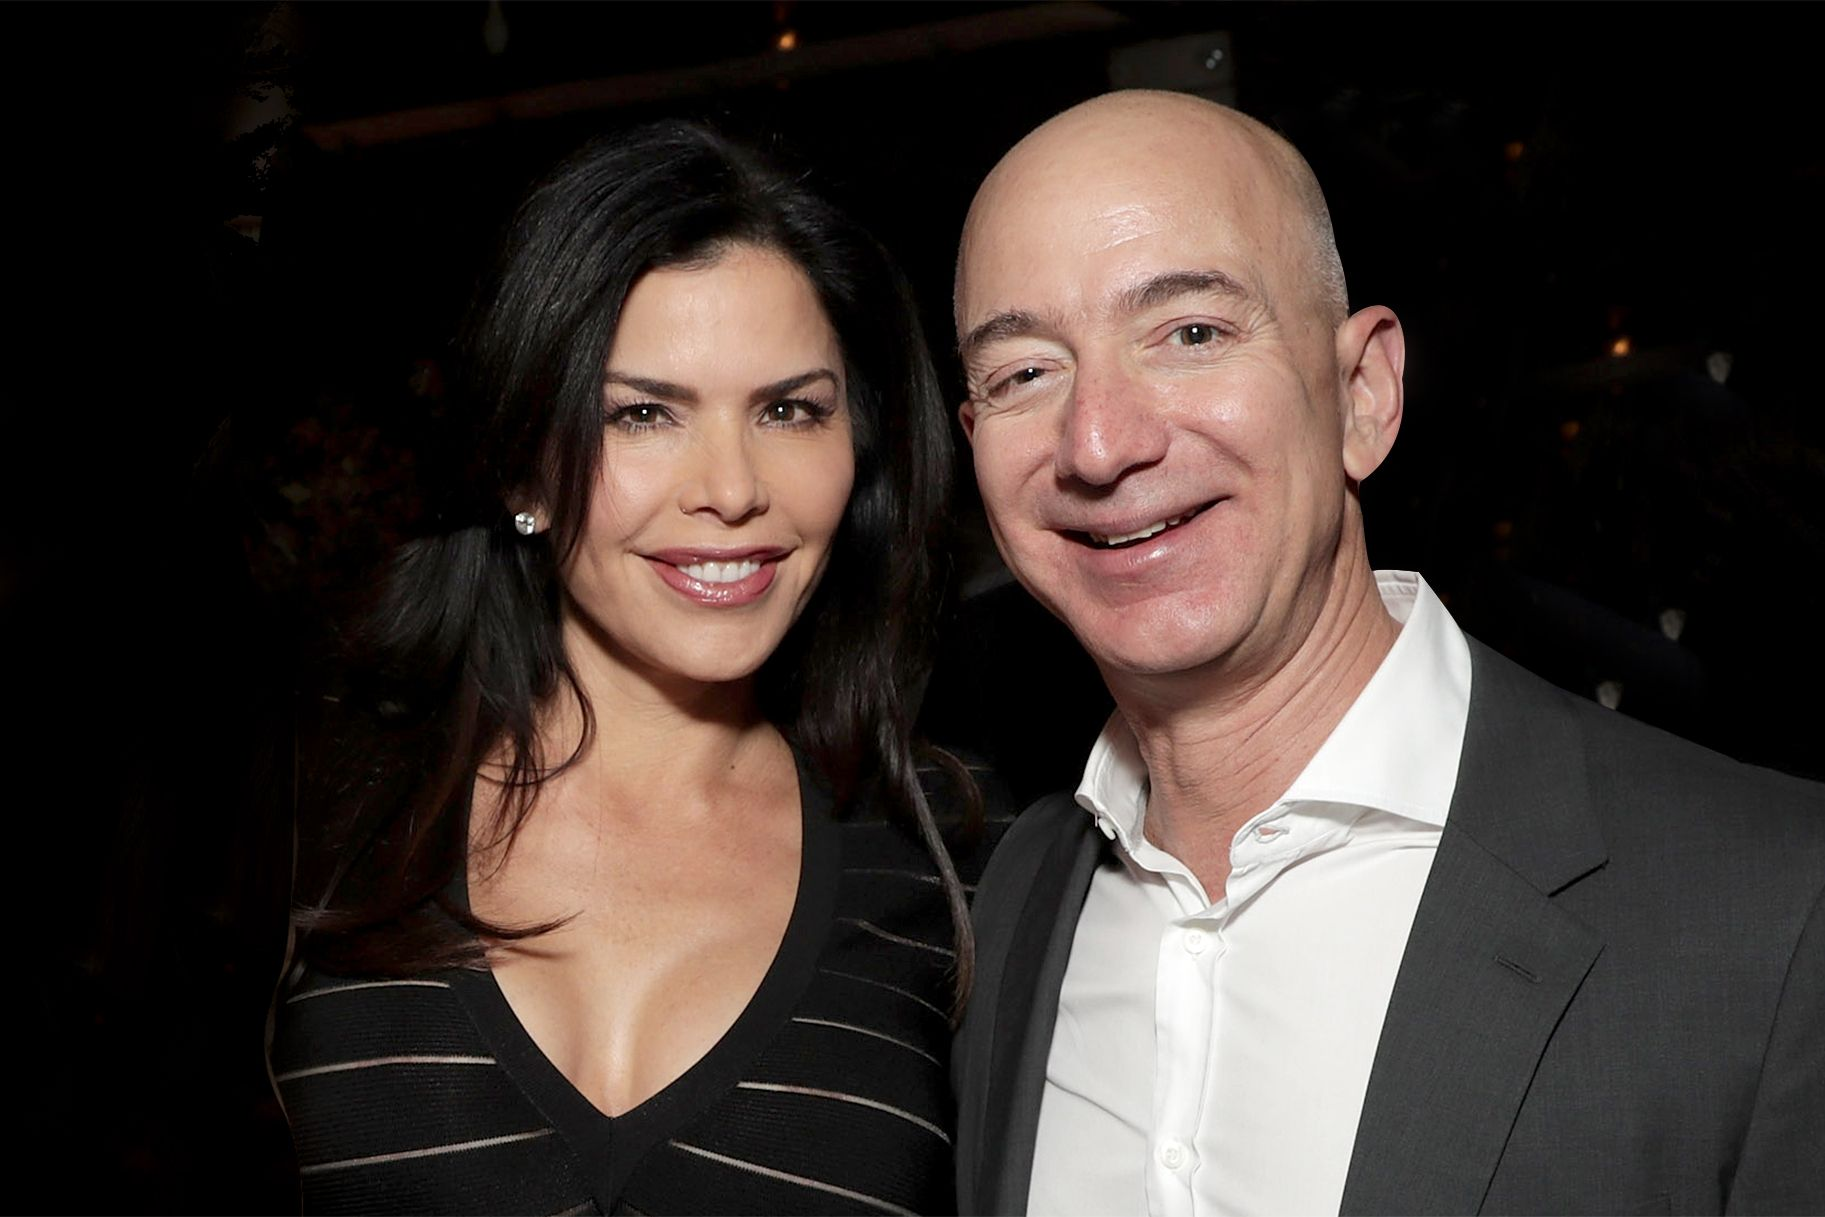 Jeff Bezos' Girlfriend Lauren Sanchez Claims to Shun